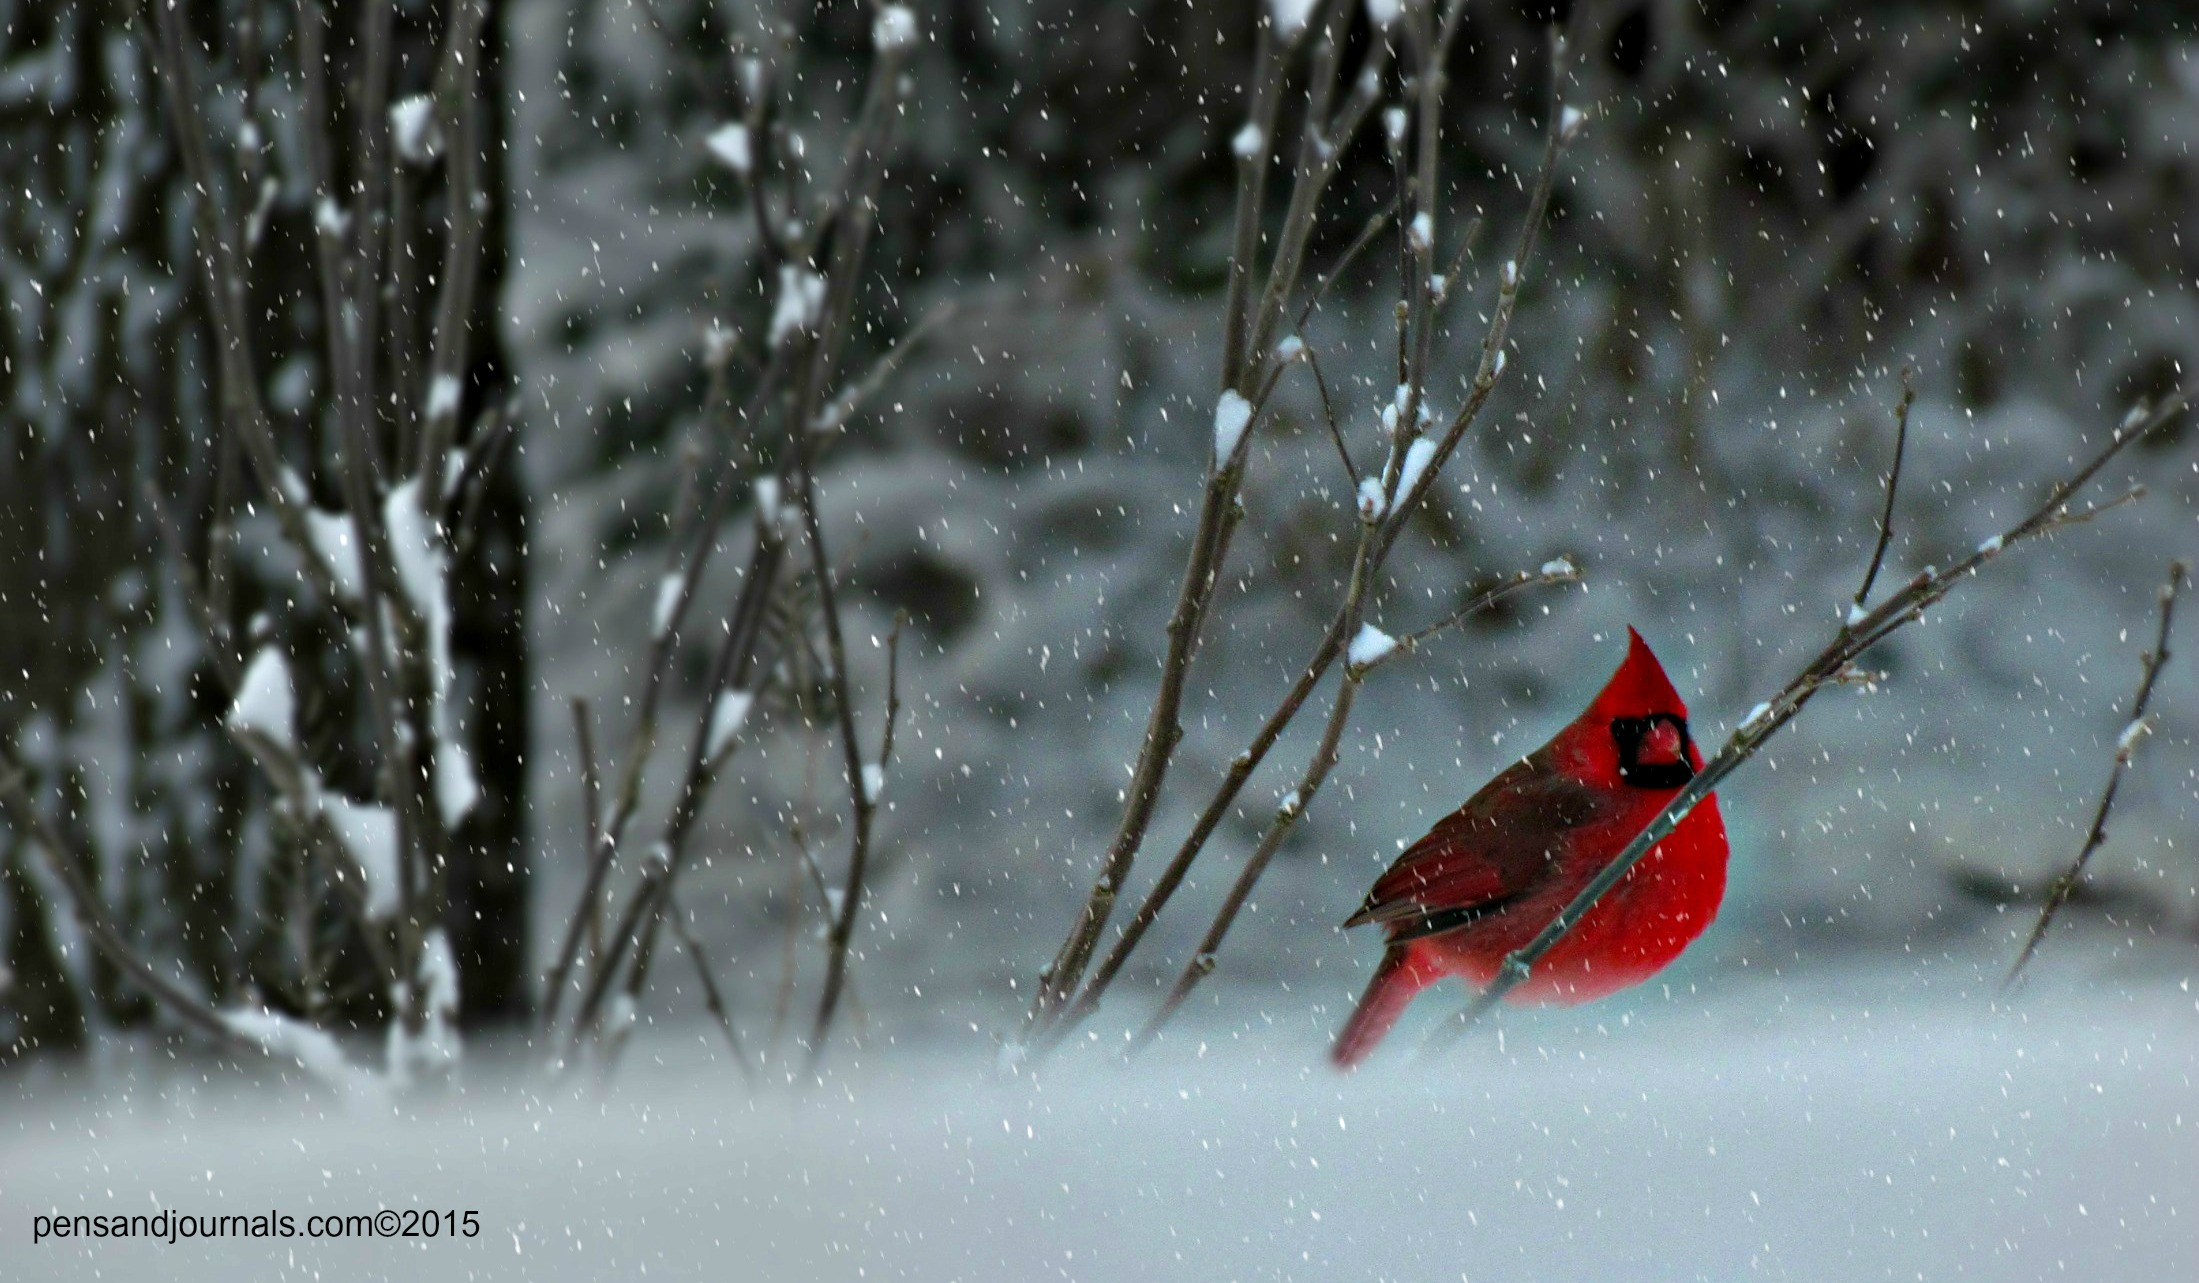 cardinal snow x flksxx - Copywdp